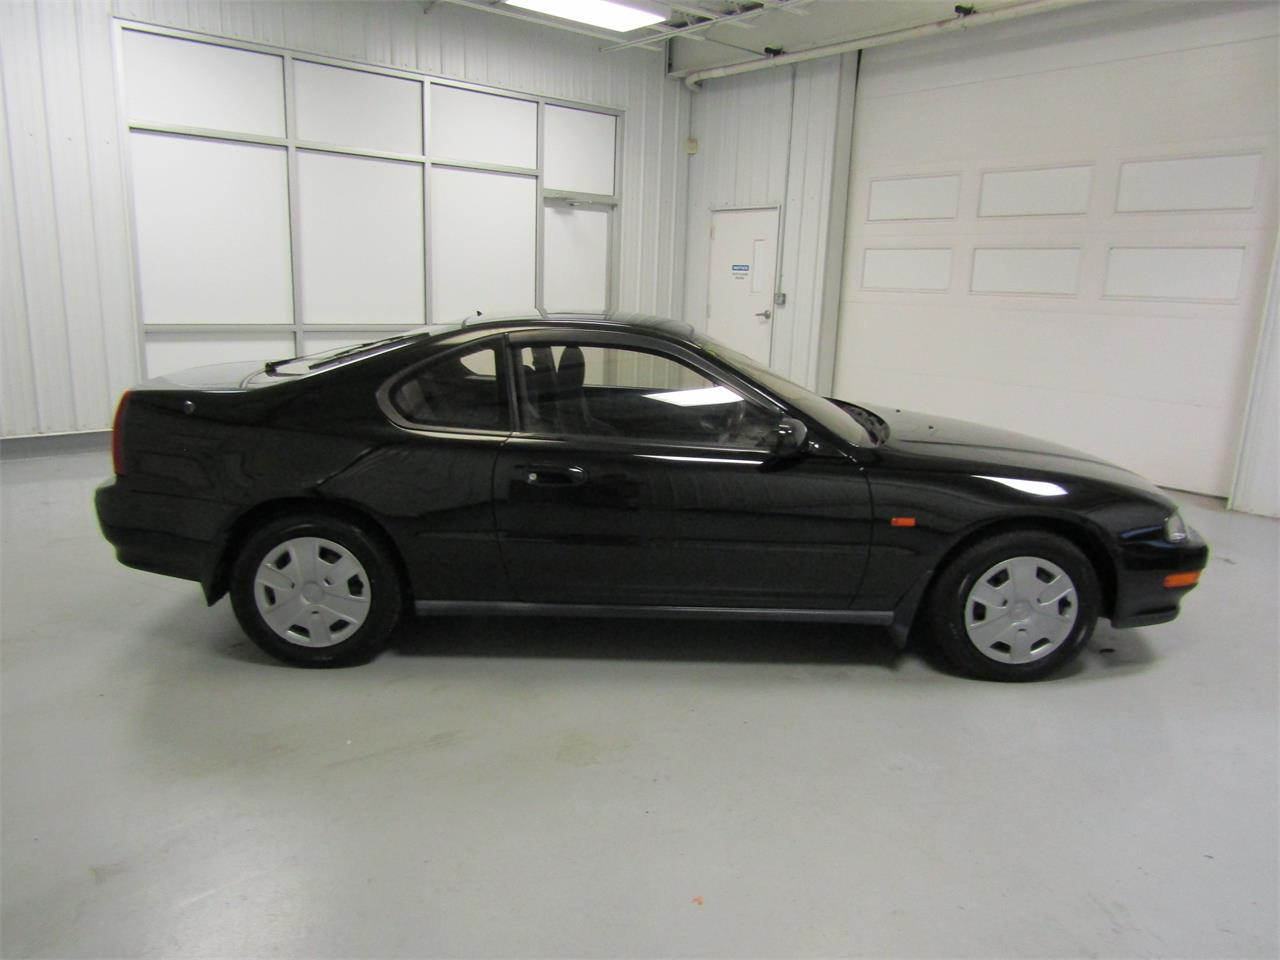 1993 Honda Prelude (CC-1114399) for sale in Christiansburg, Virginia